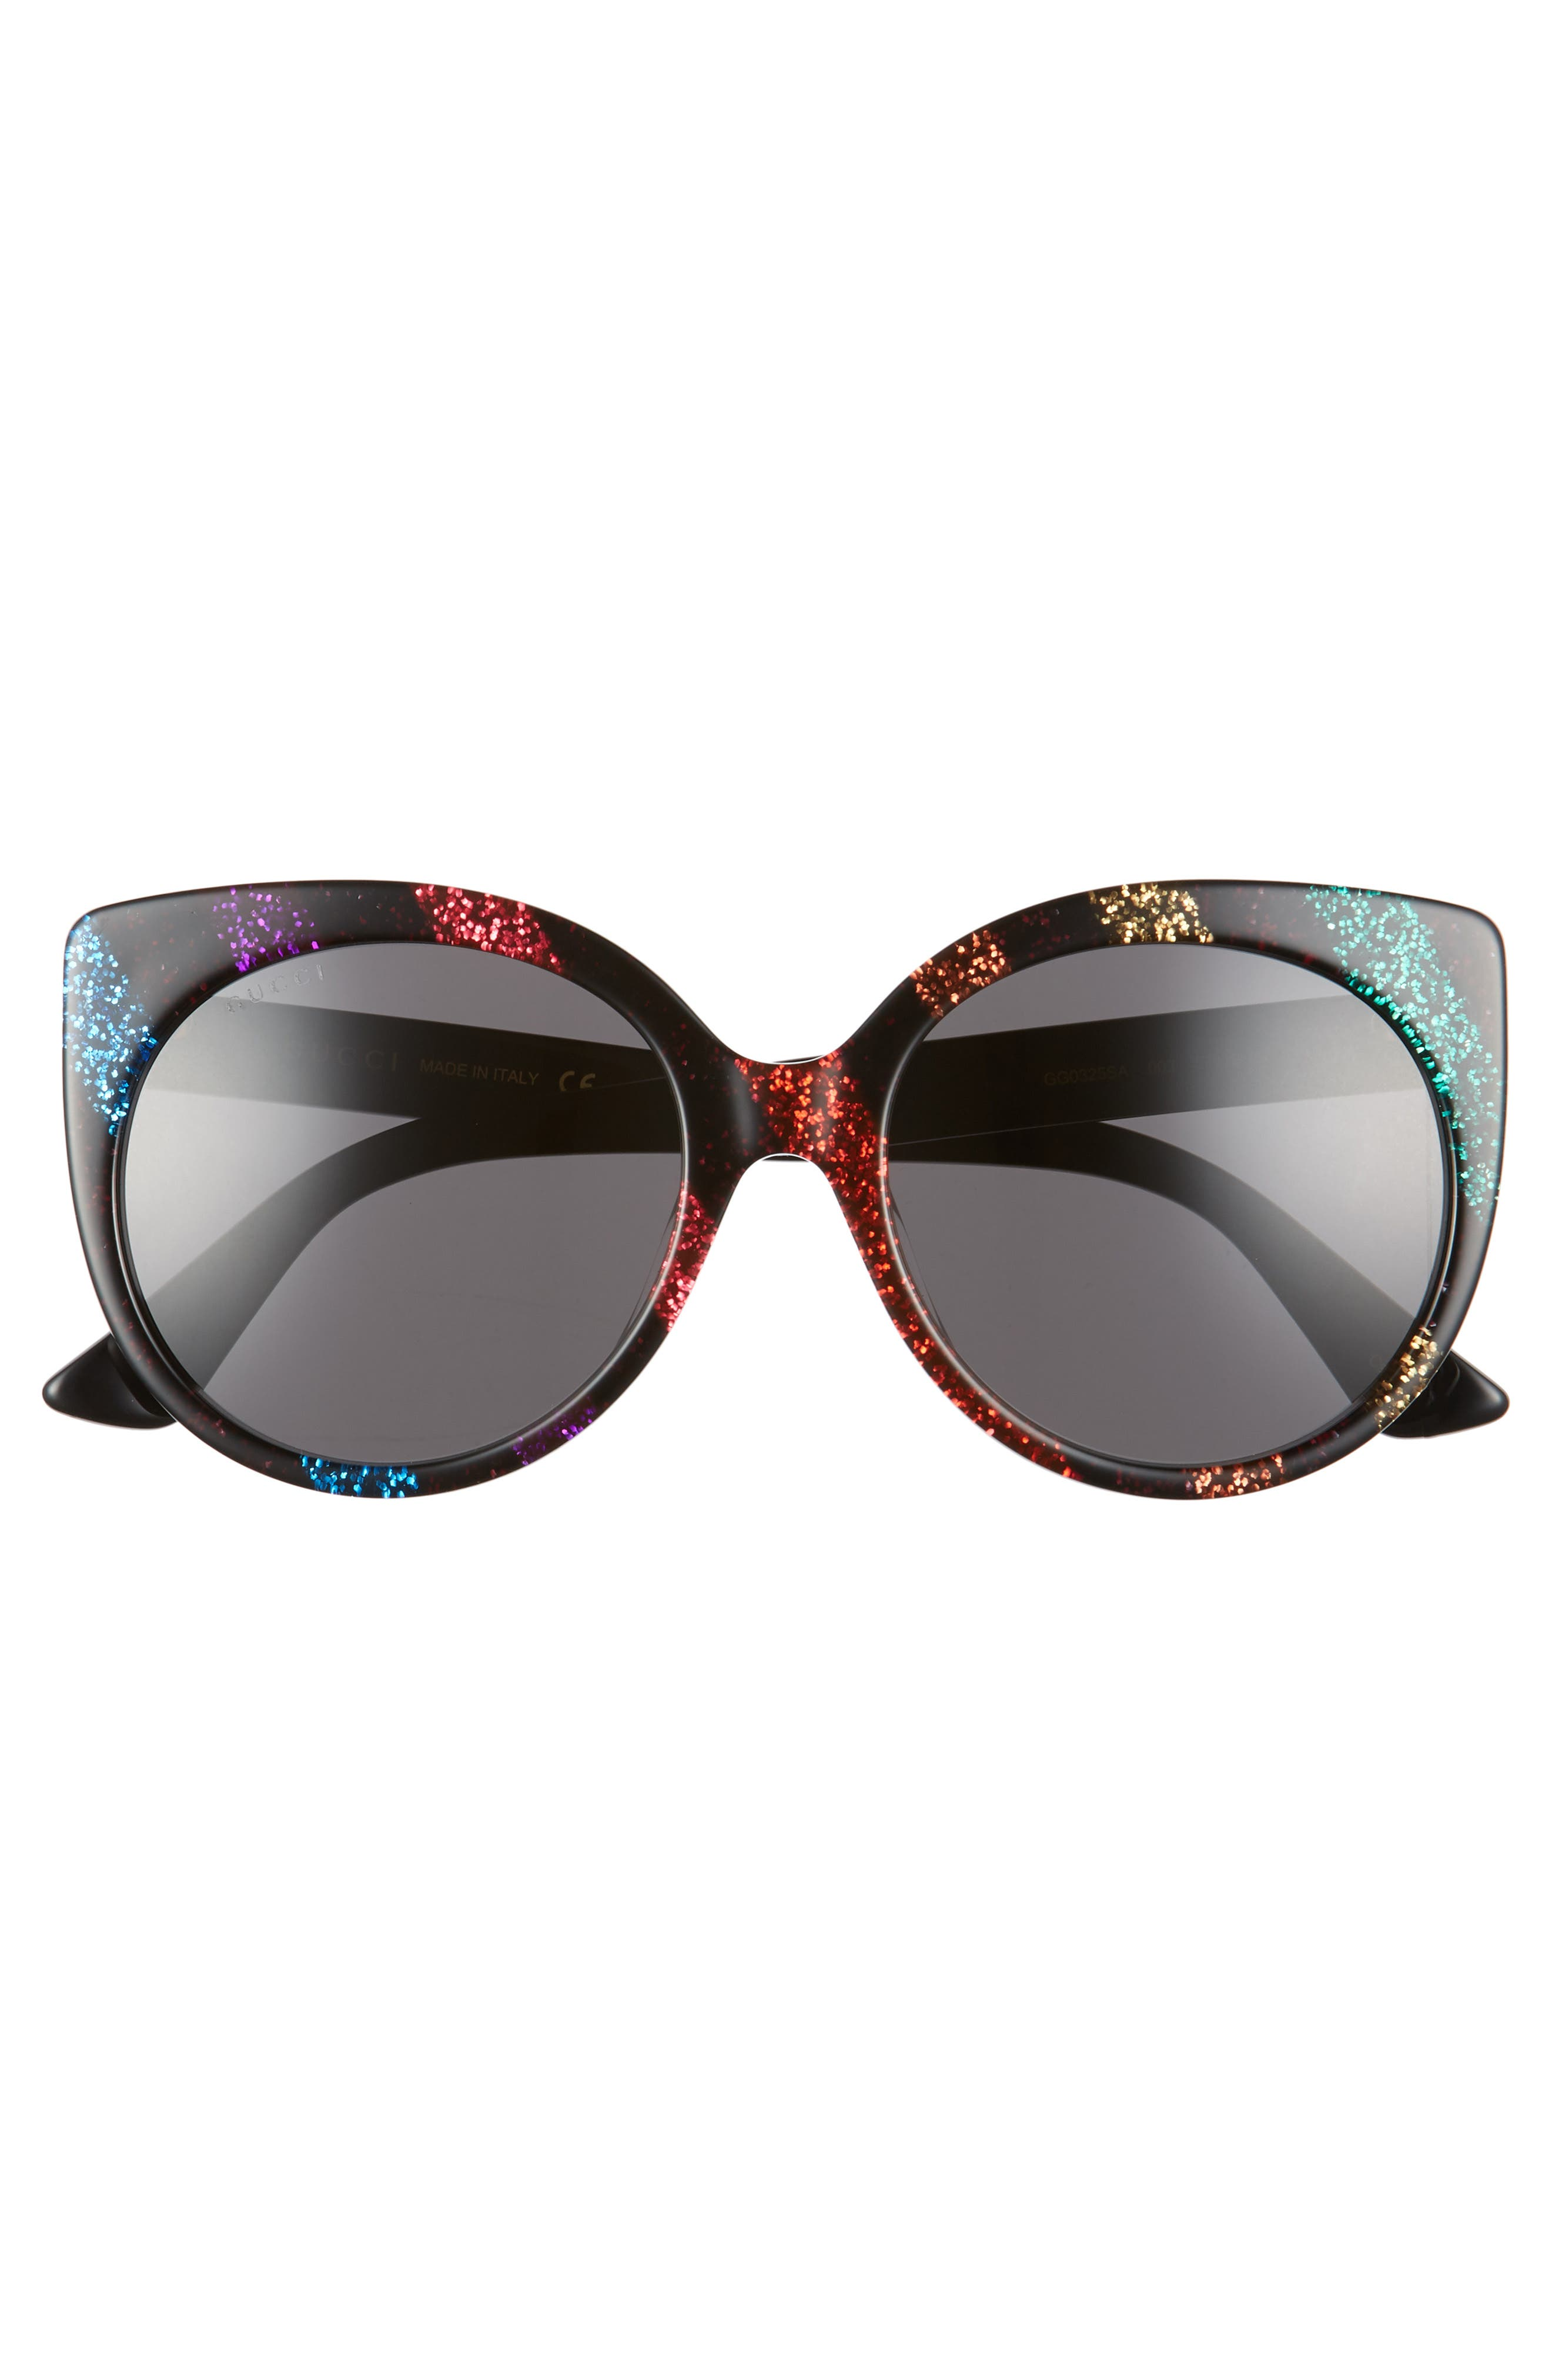 57mm Cat Eye Sunglasses,                             Alternate thumbnail 3, color,                             010